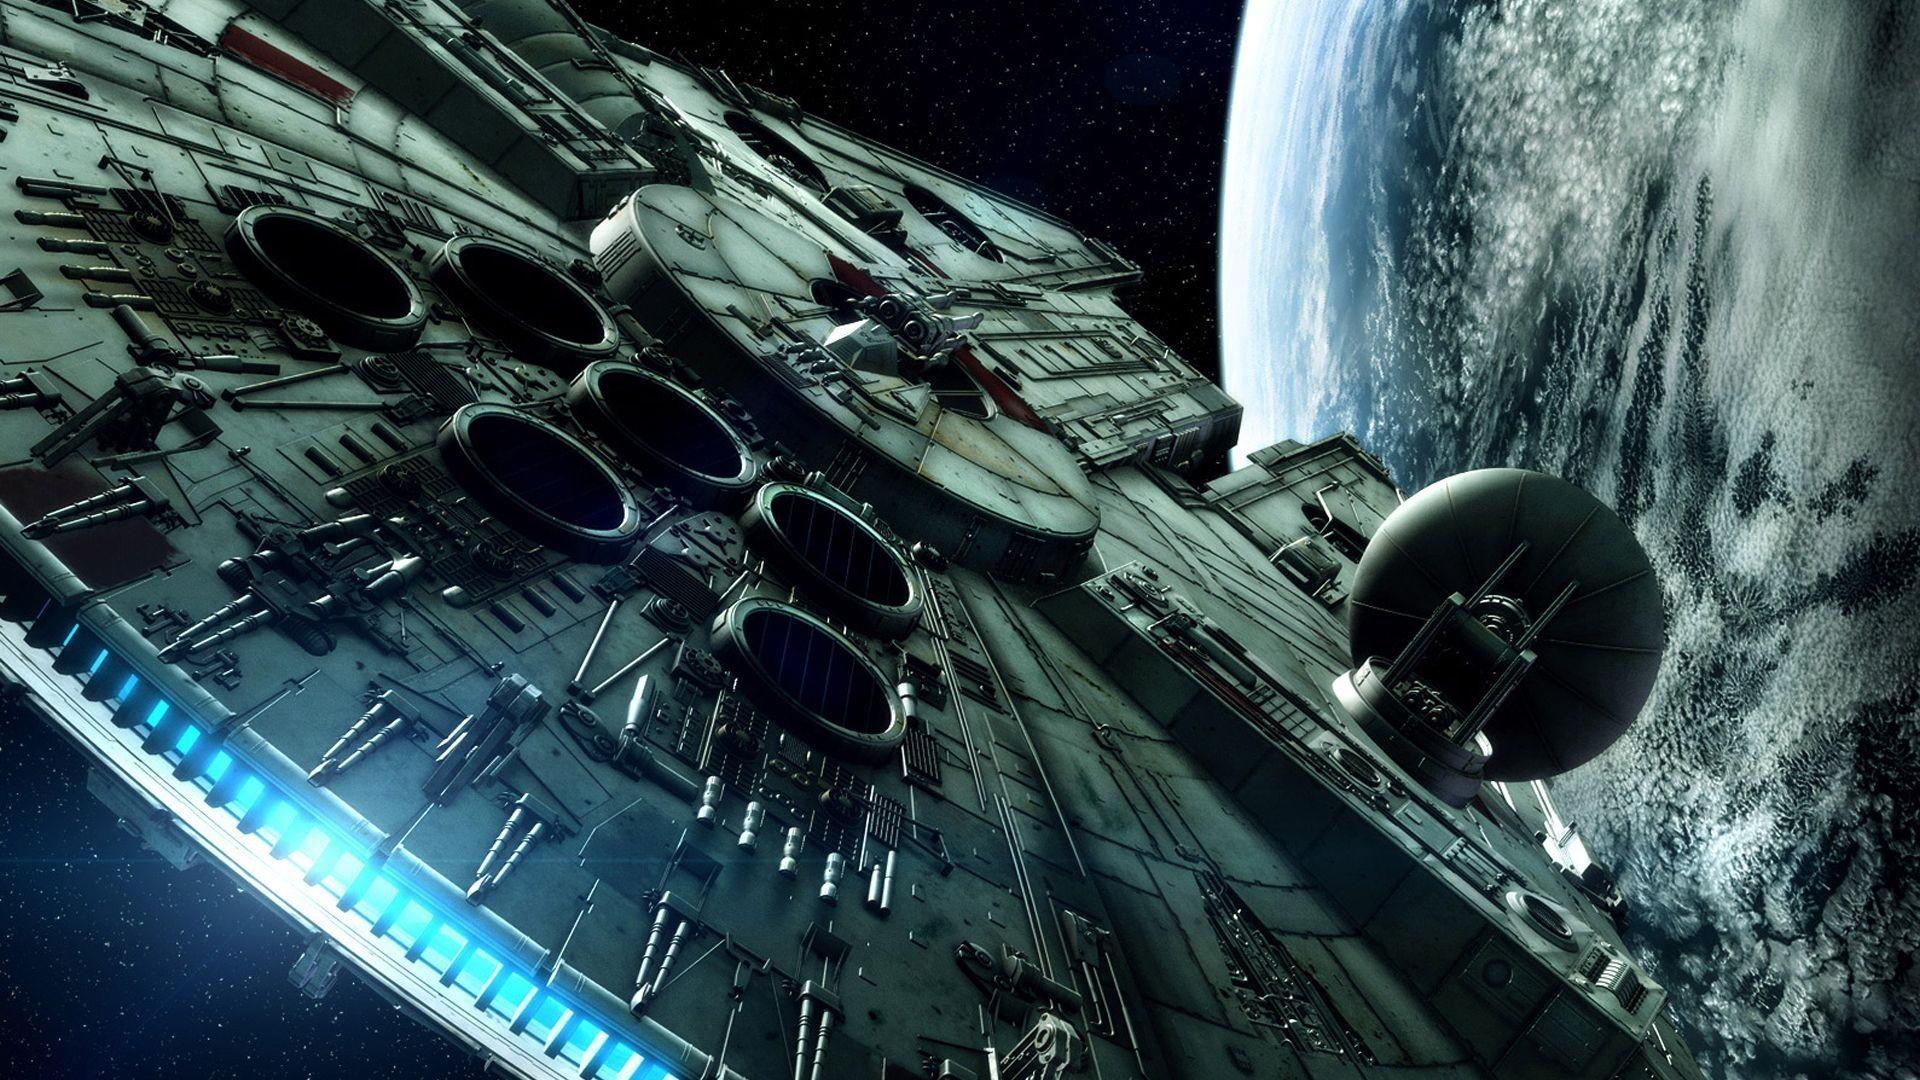 star wars wallpaper hd 1080P widescreen – HD WALLPAPER WIDE